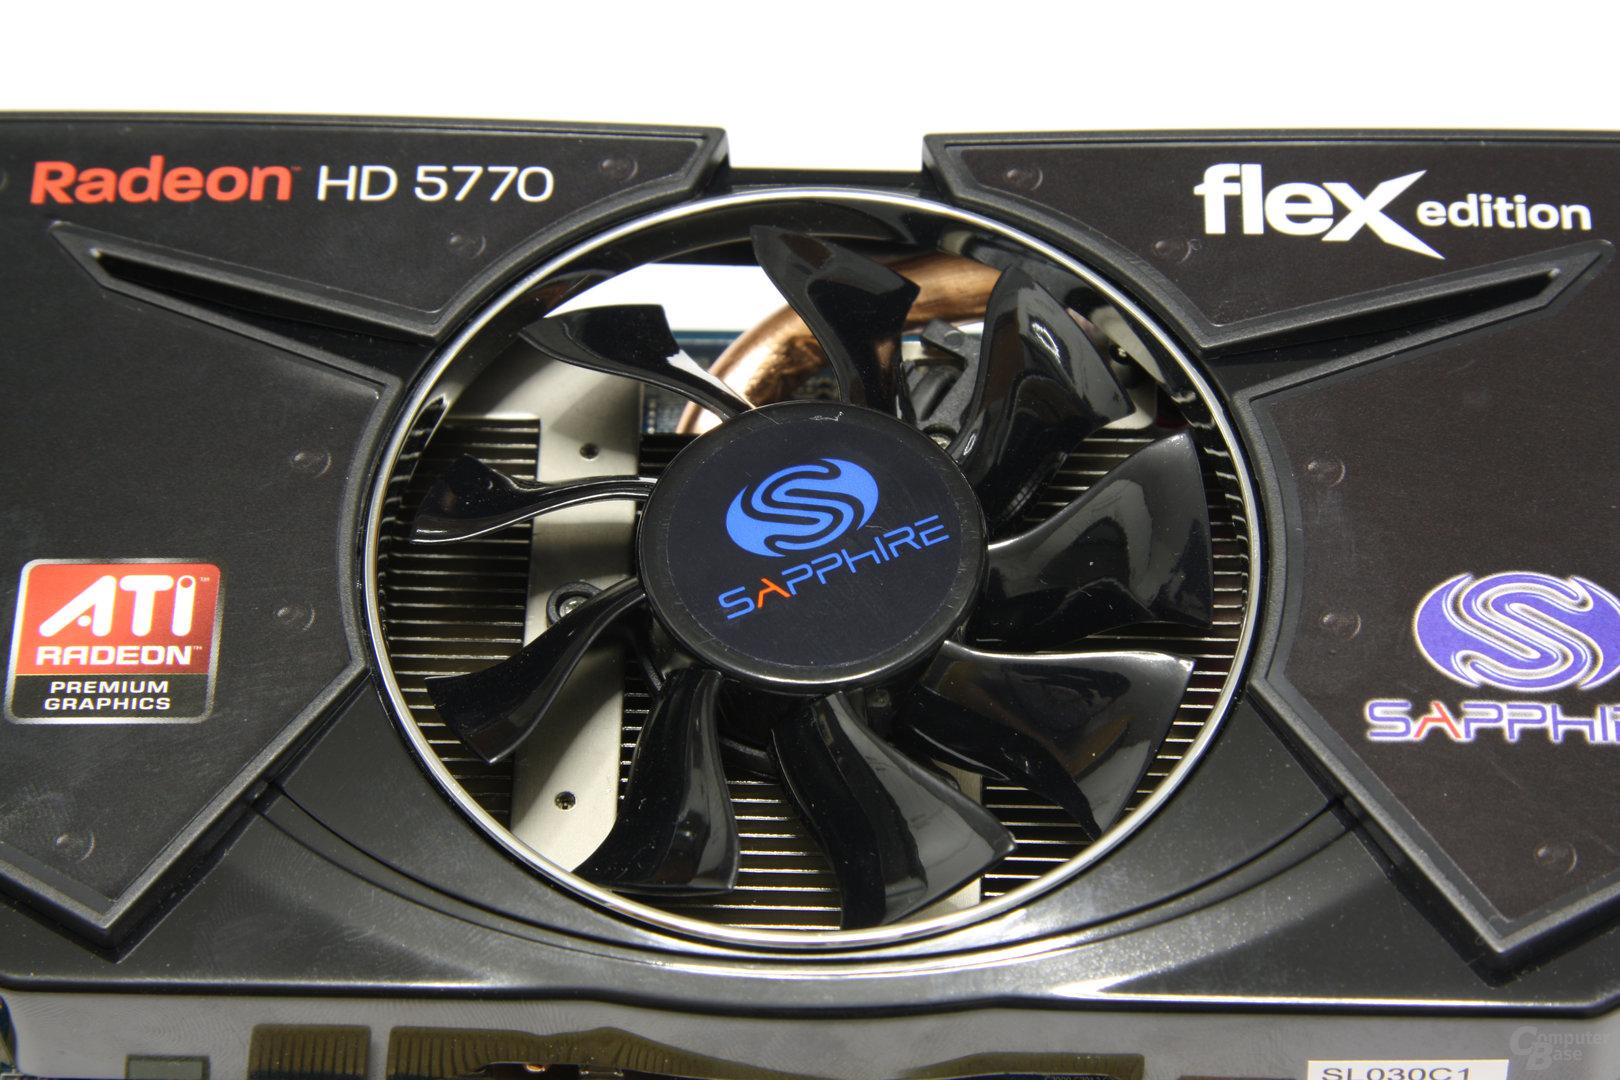 Radeon HD 5770 Flex Lüfter